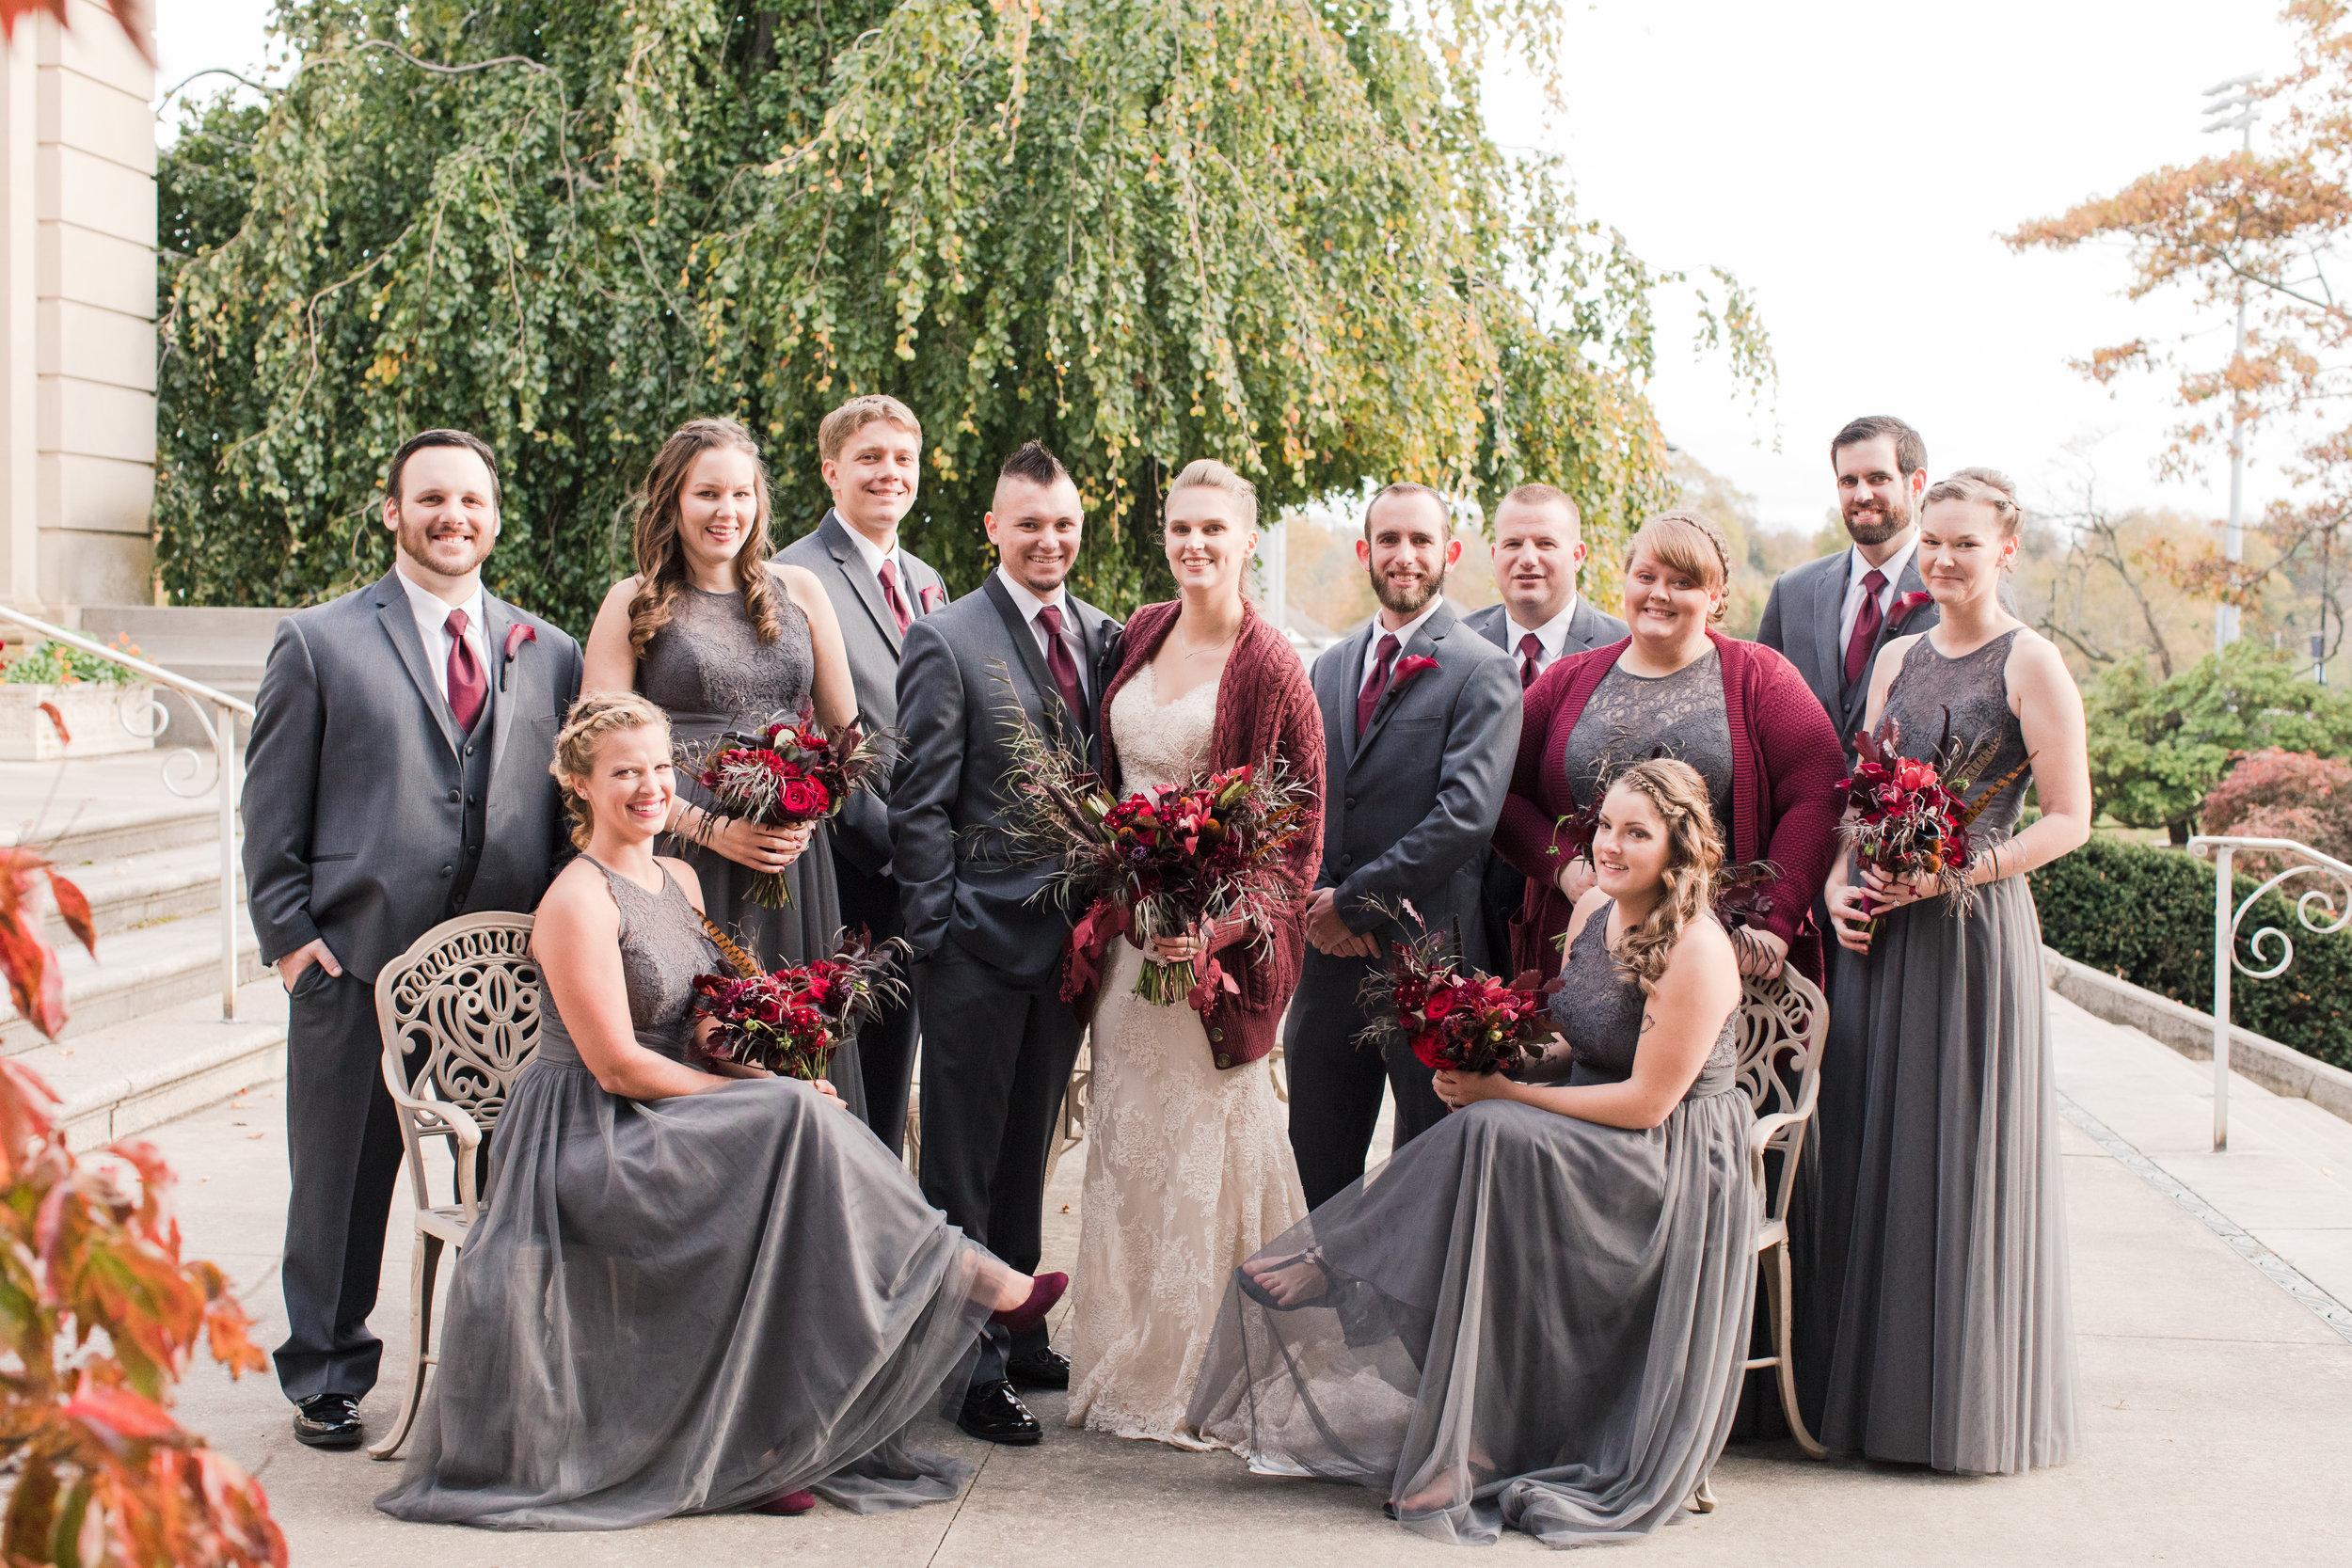 Formal fall bridal party photo at Monmouth University